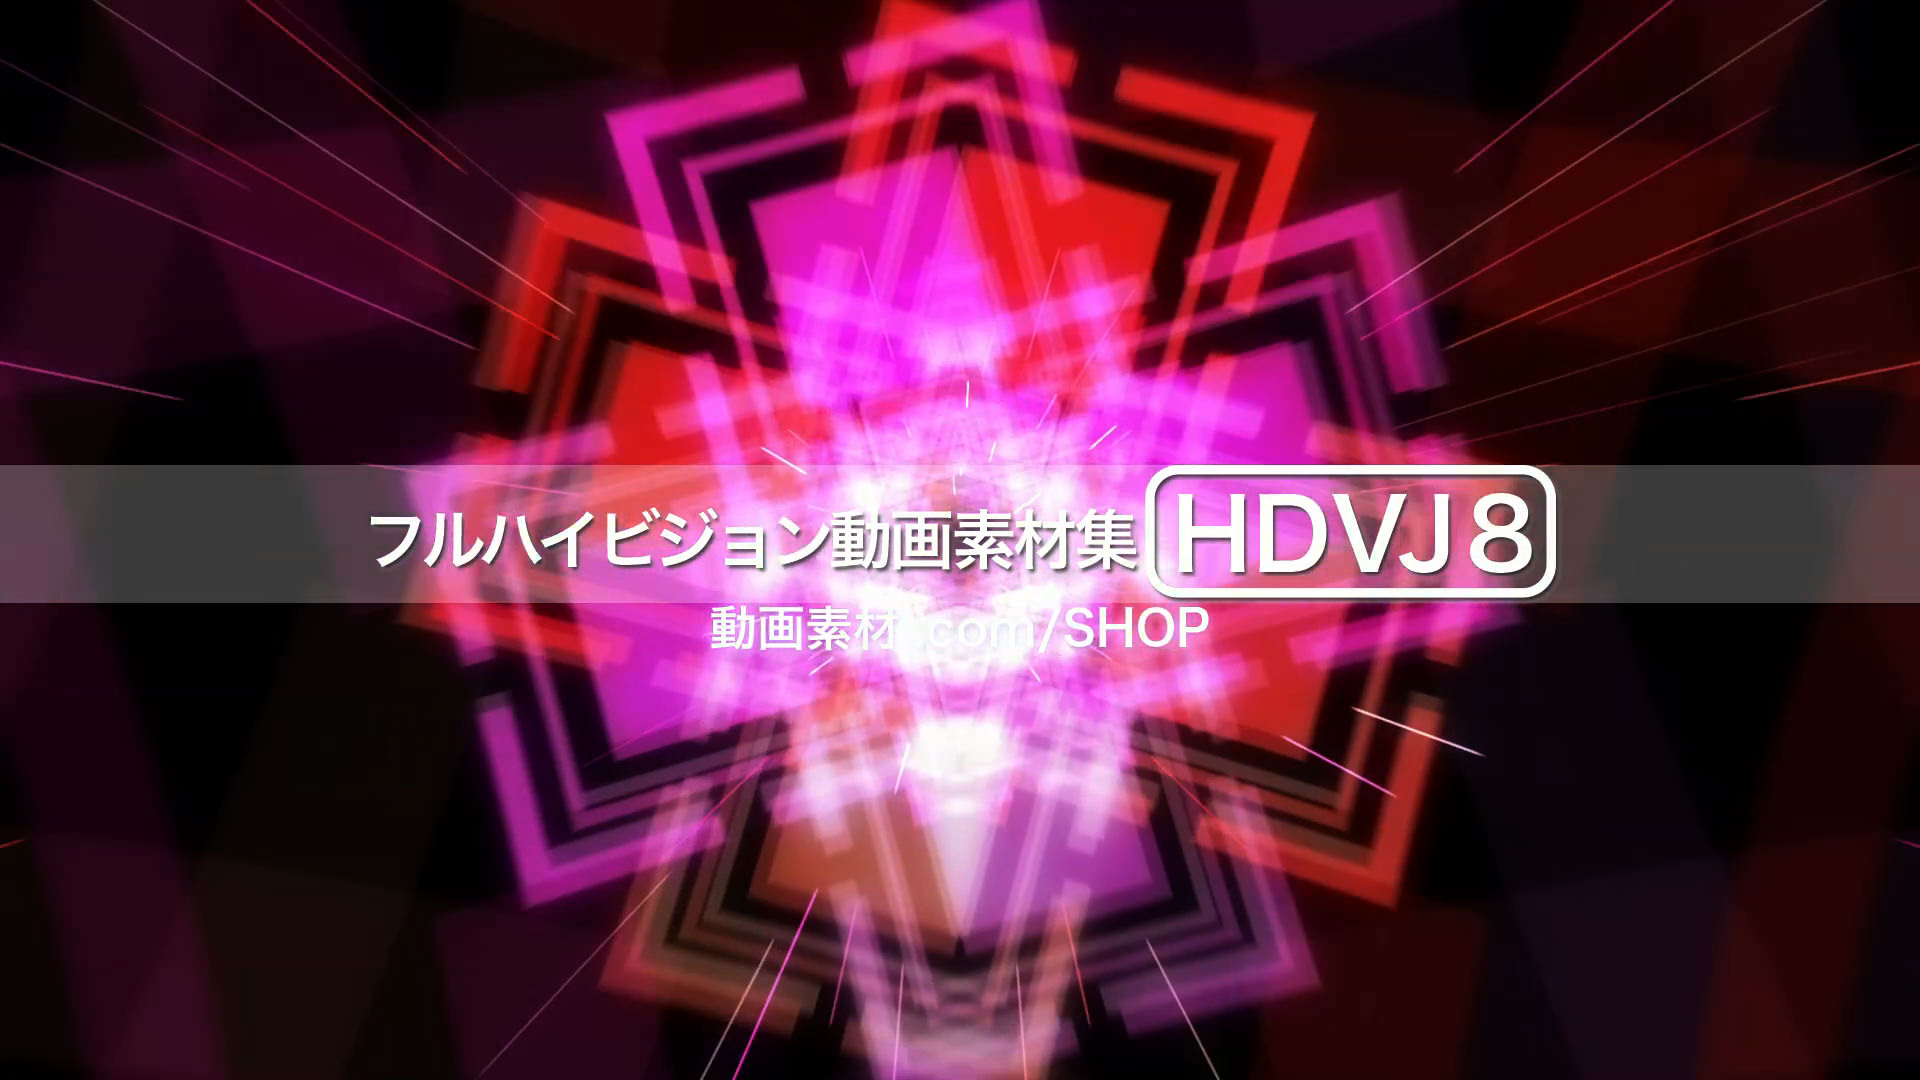 MovieMaterial HDVJ8 フルハイビジョンVJ動画素材集 画像8